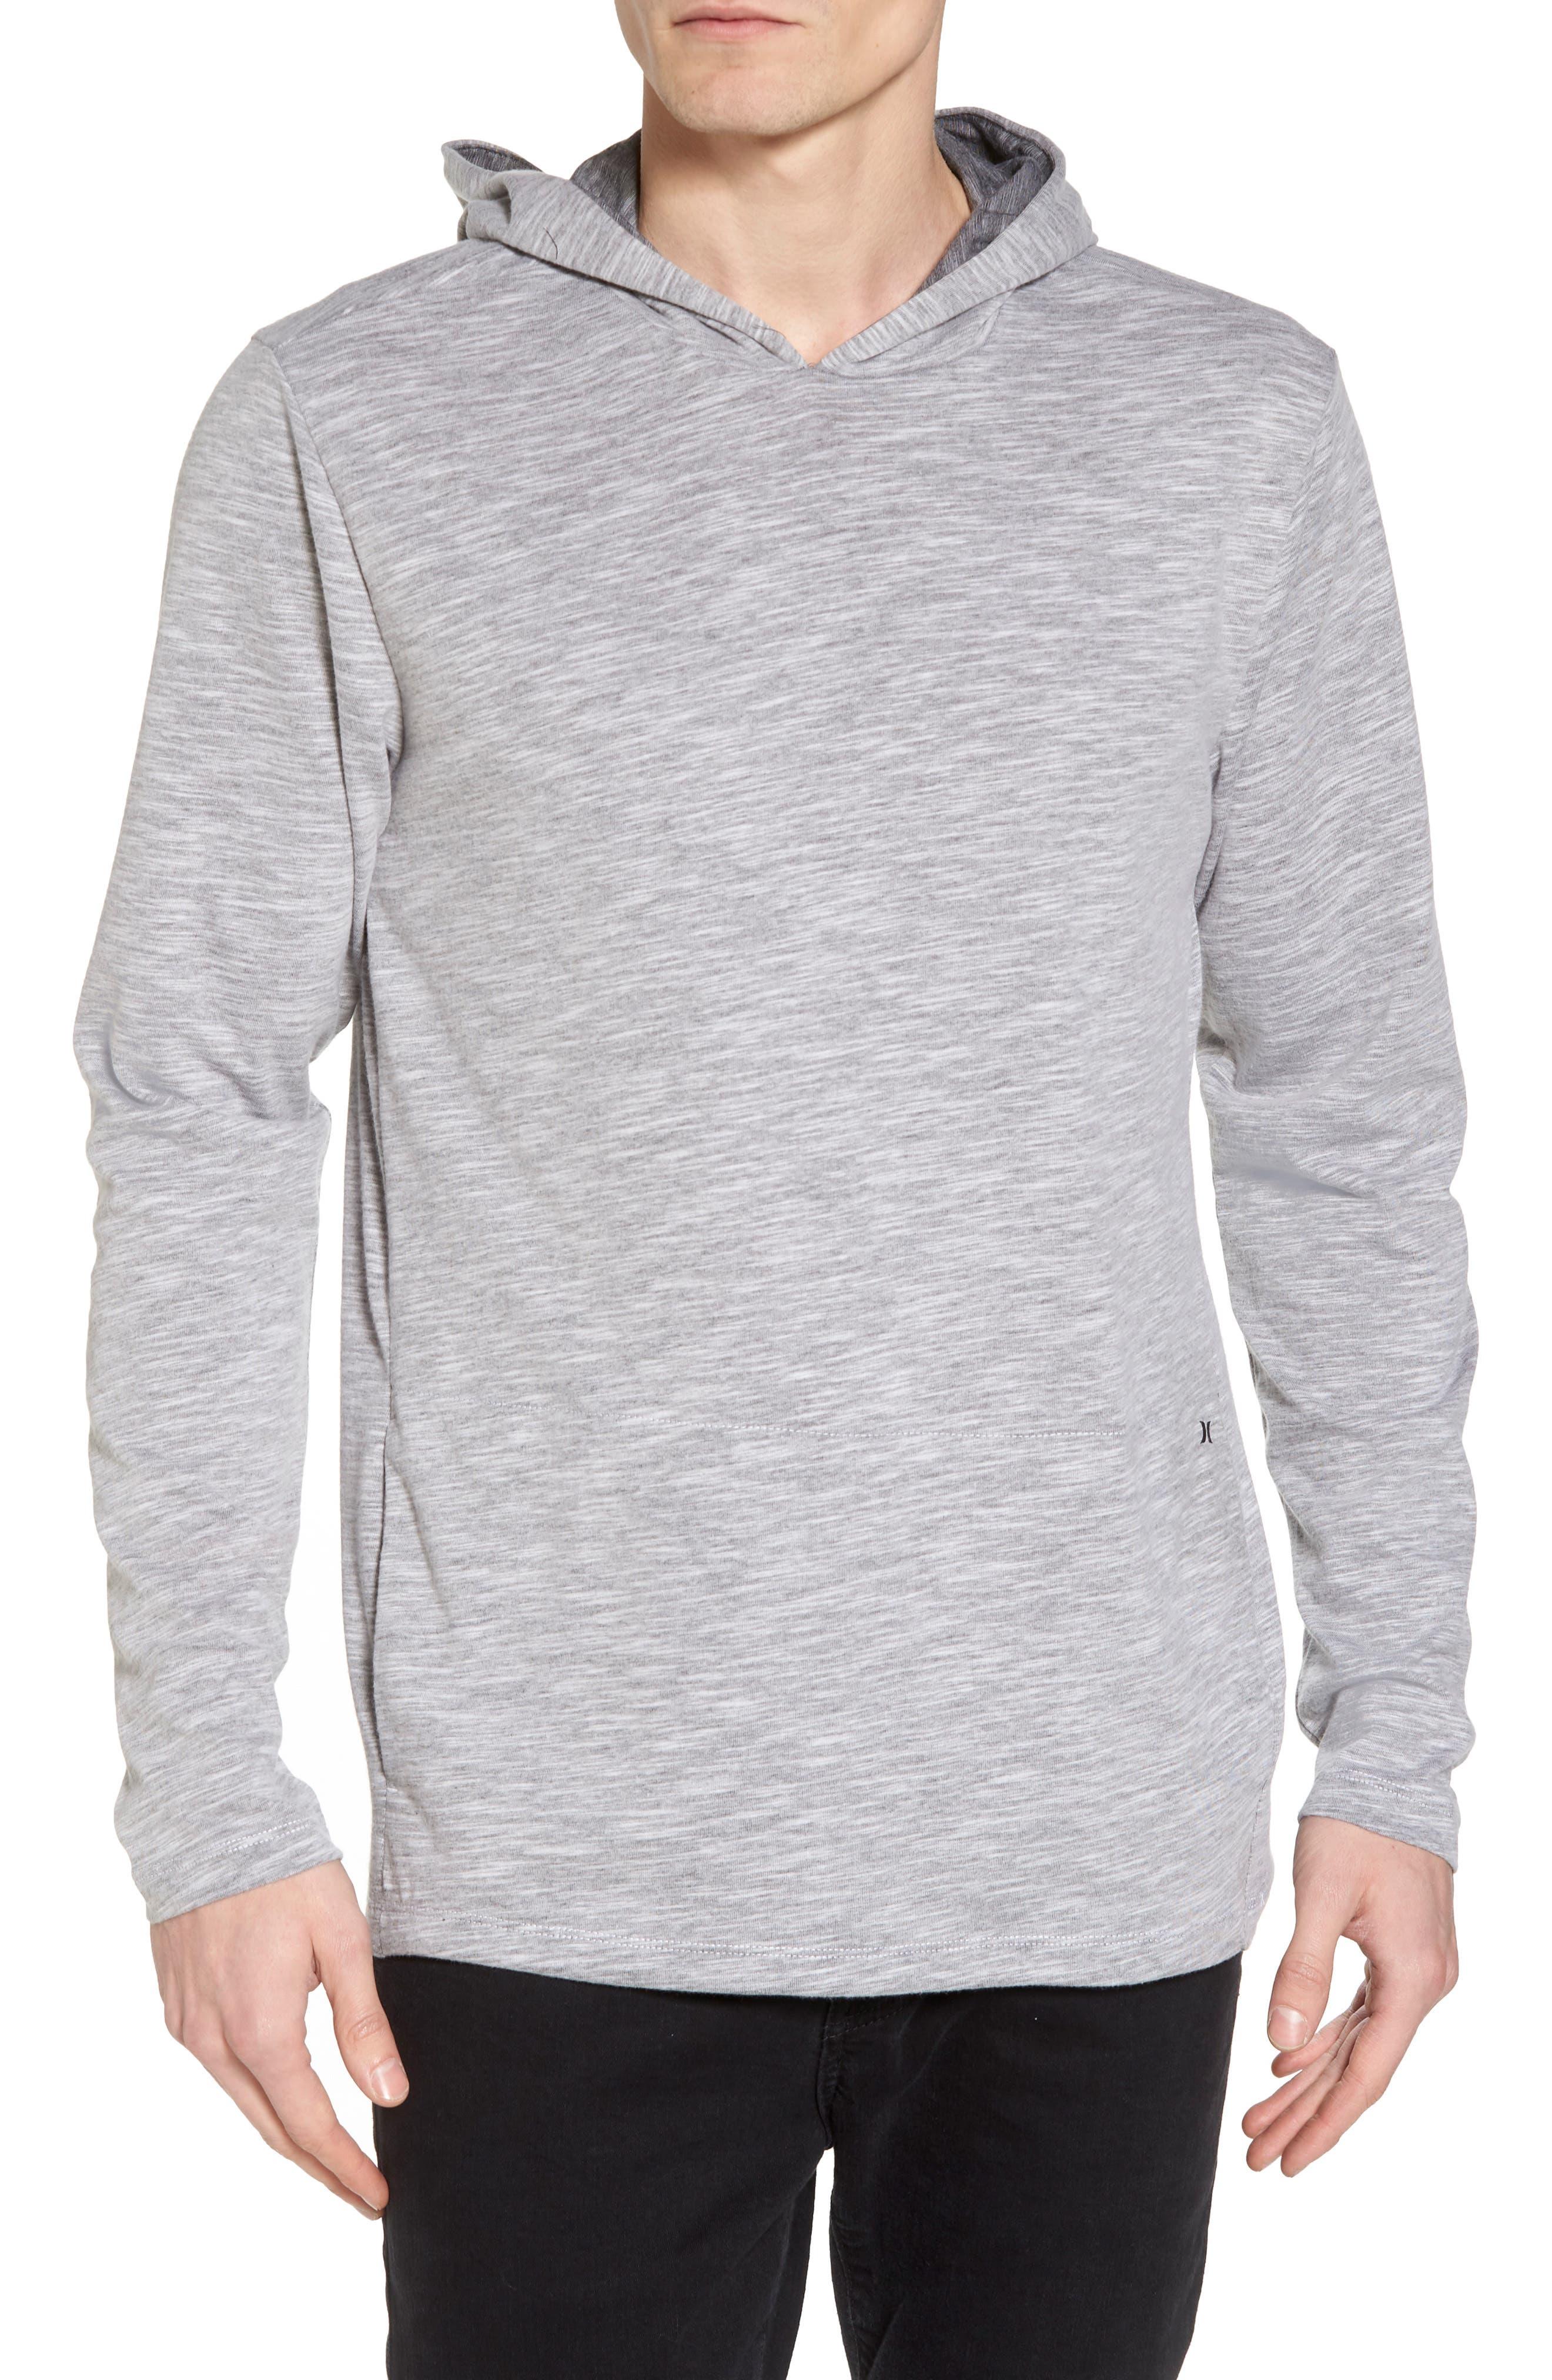 Lagos Dry Hoodie,                         Main,                         color, Dark Grey